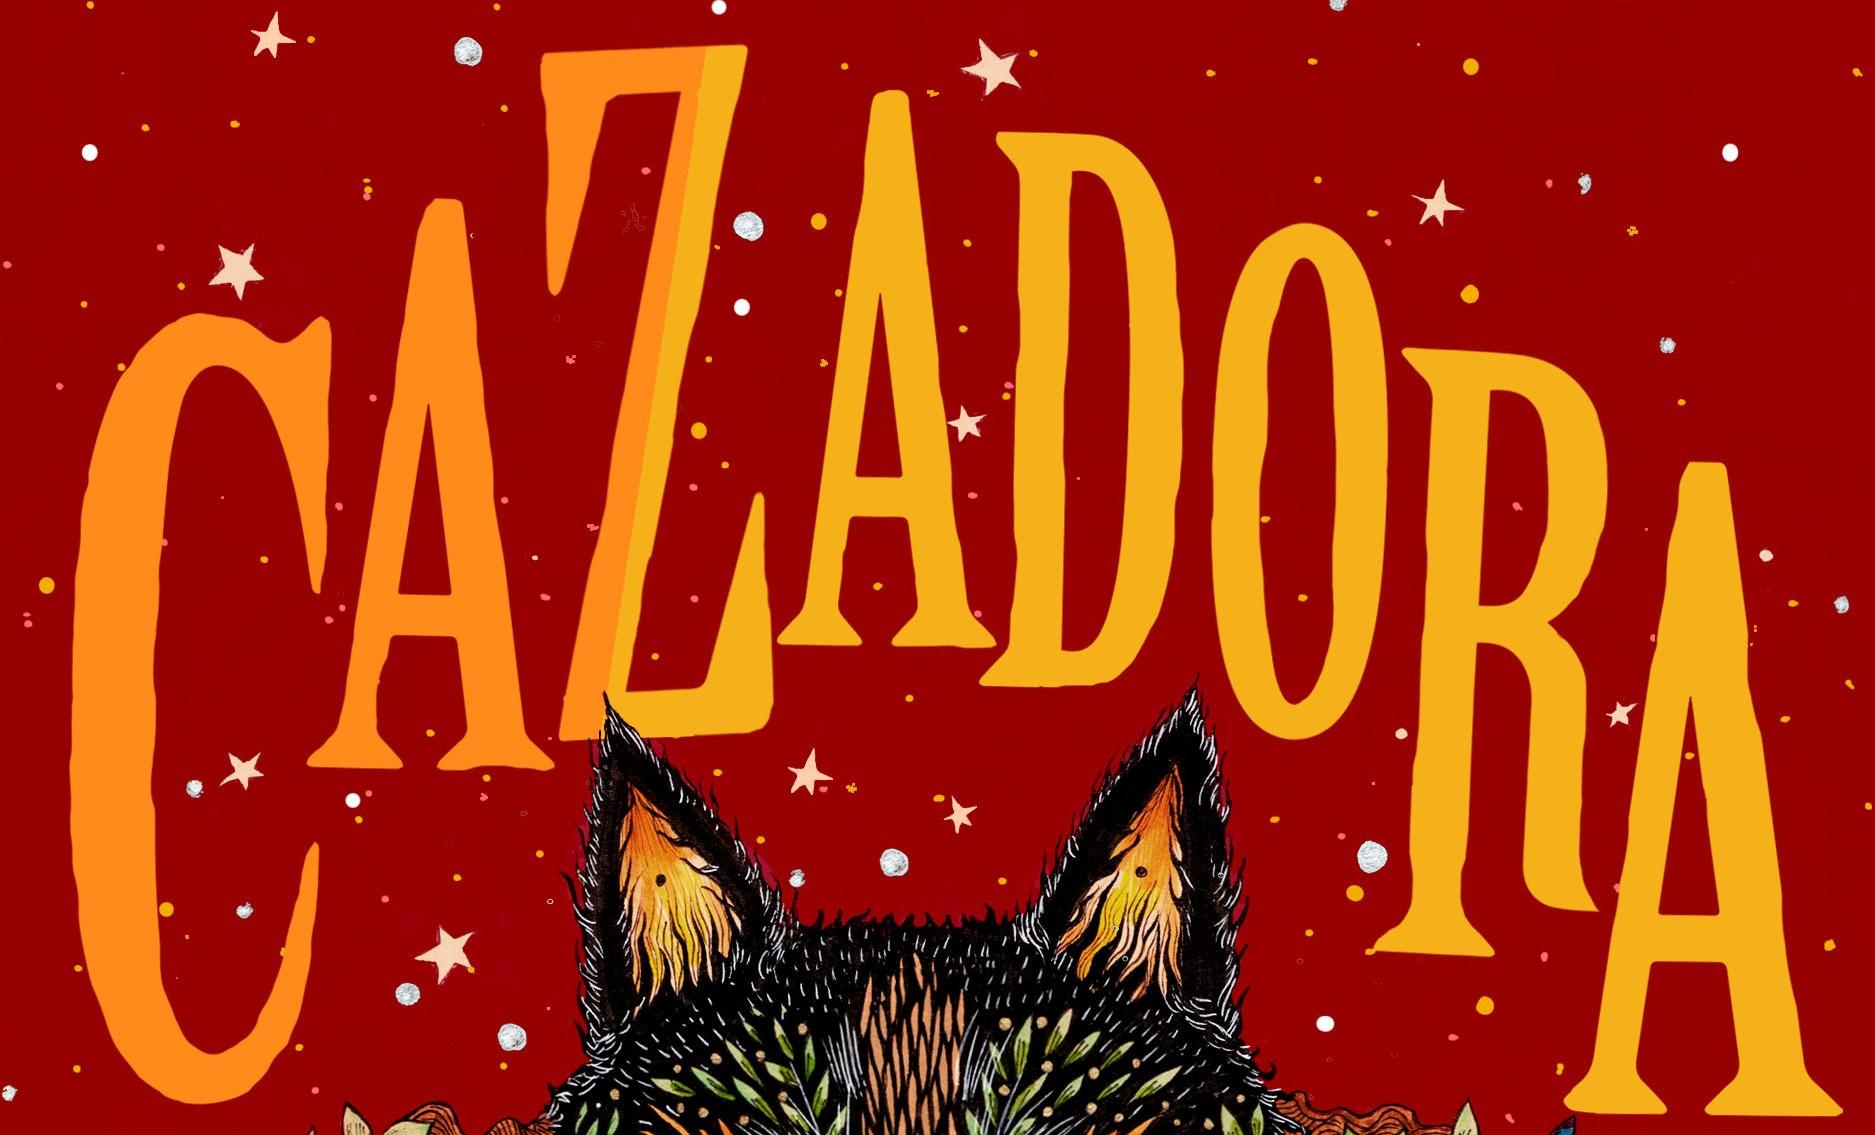 Cazadora by Romina Garber – 4 Star Book Review